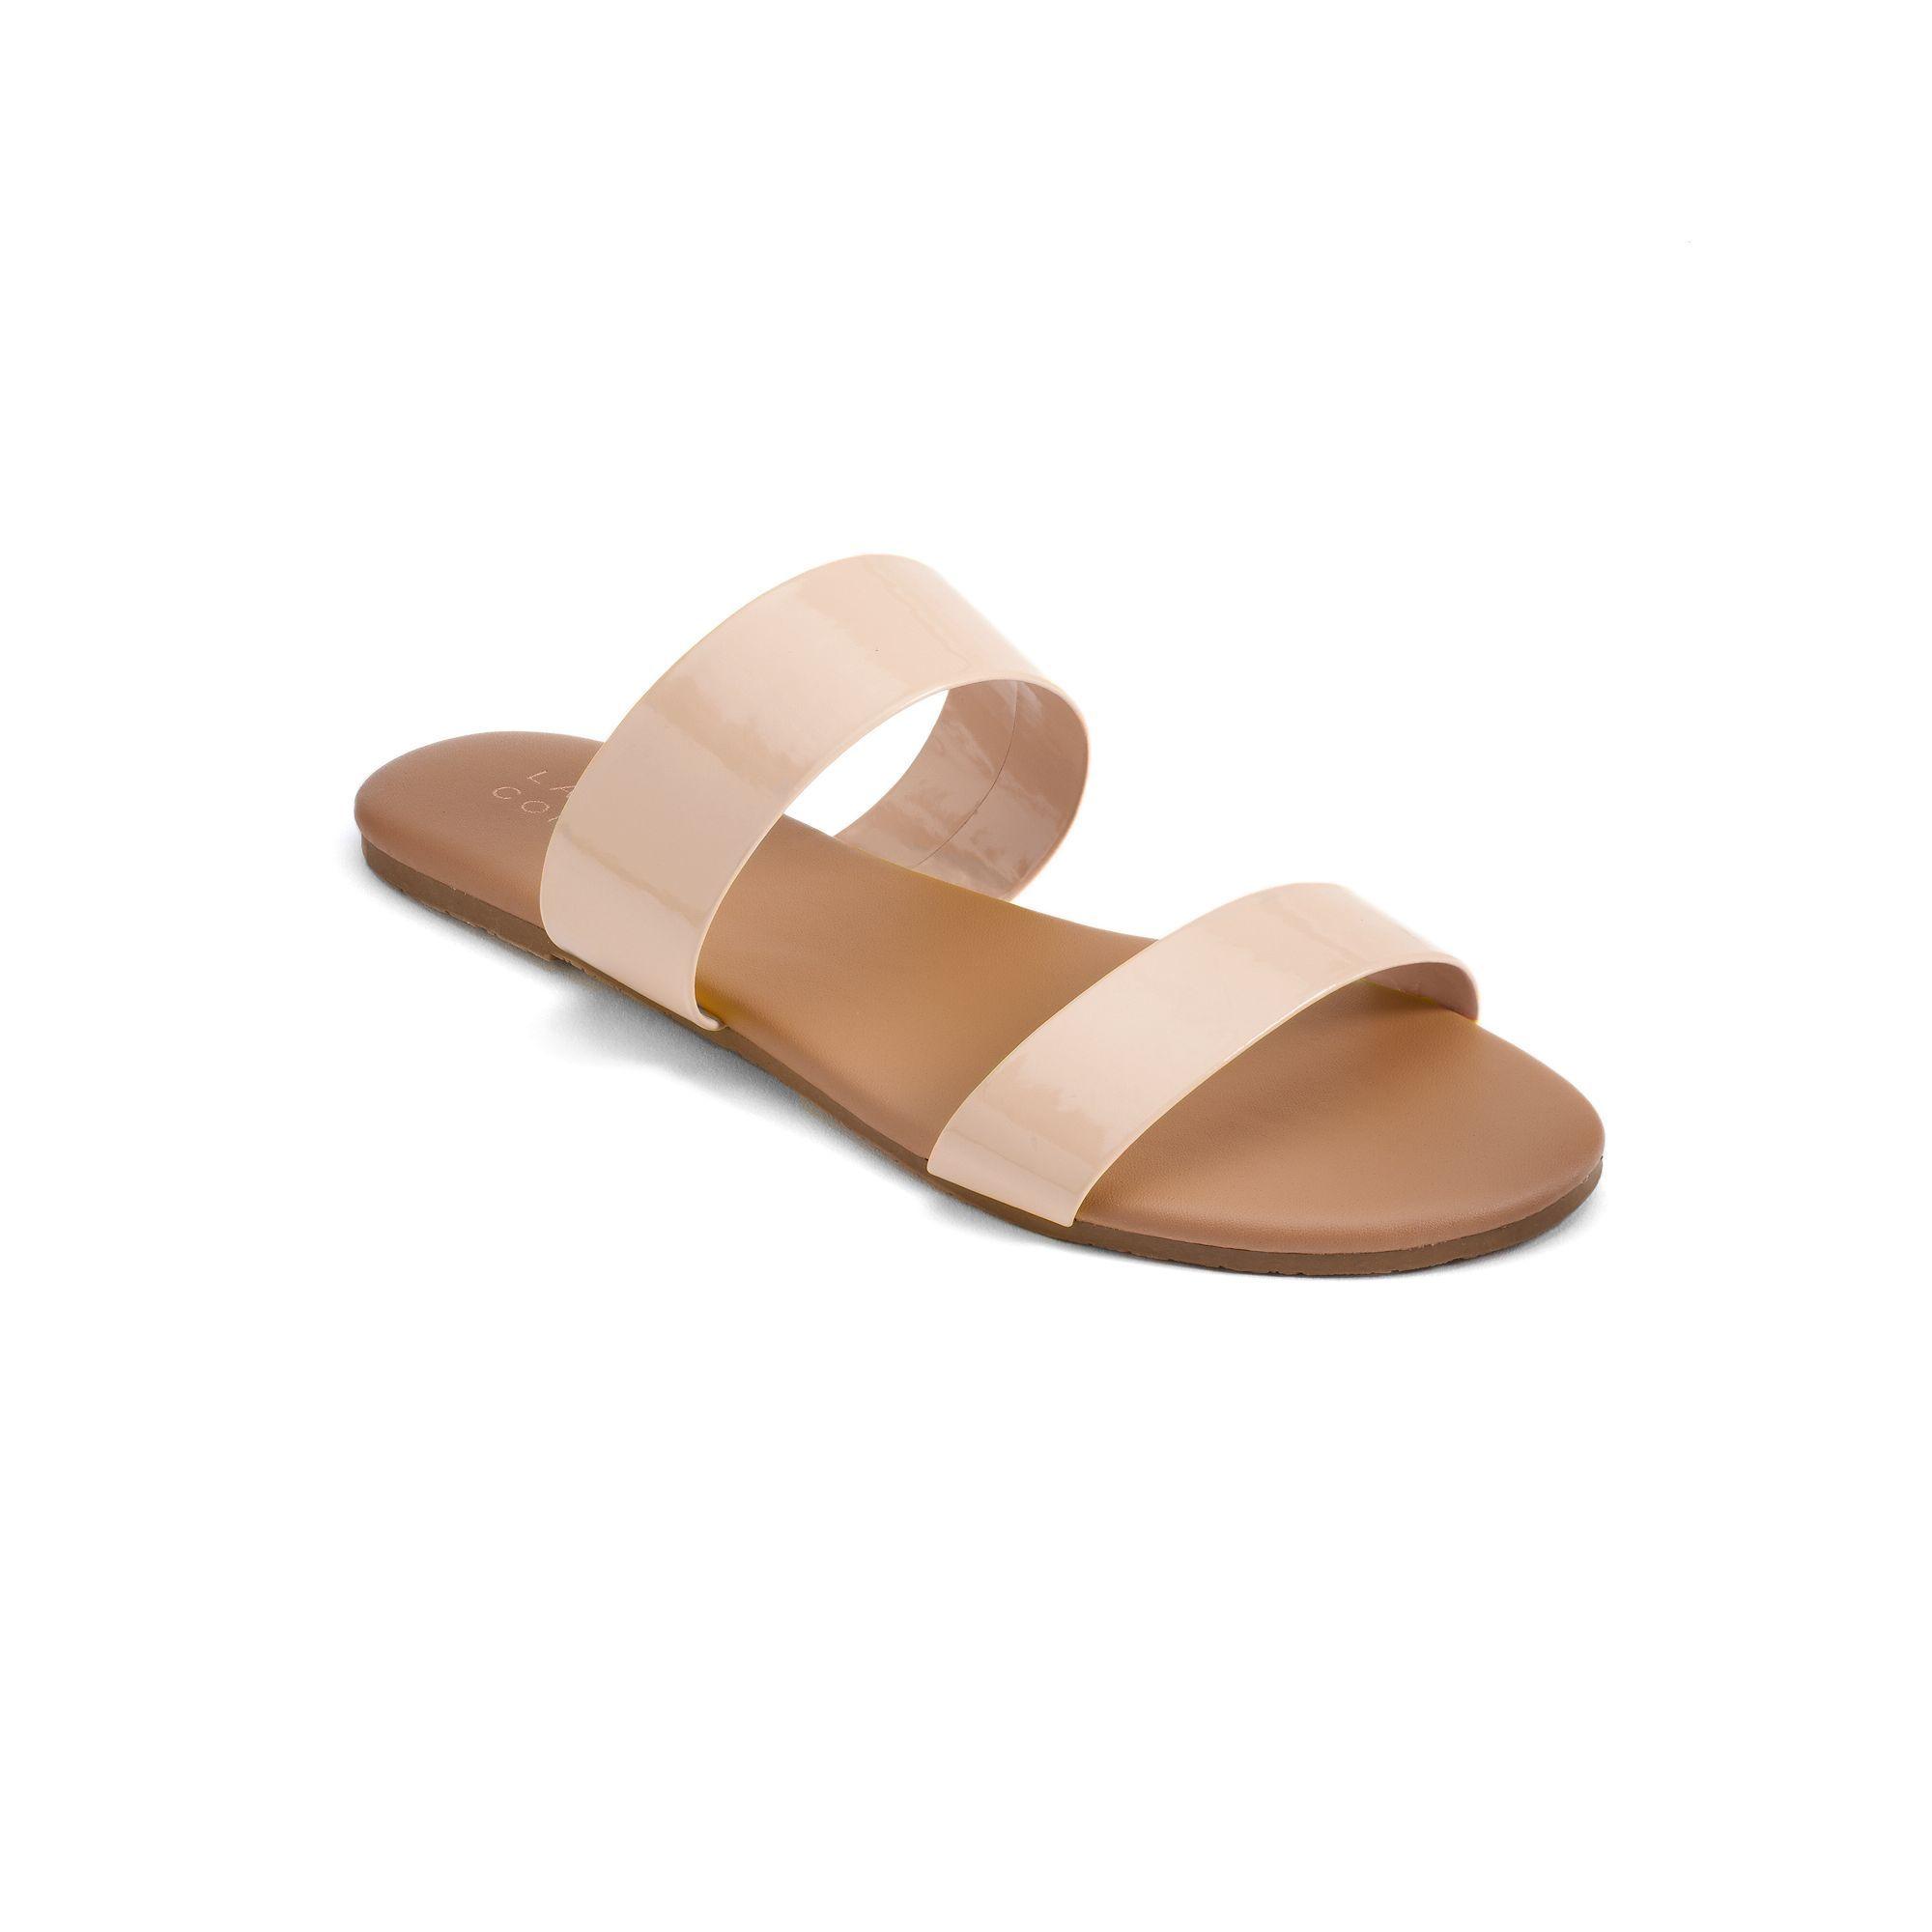 3f1ebe49e267d LC Lauren Conrad Firefli Women s Sandals